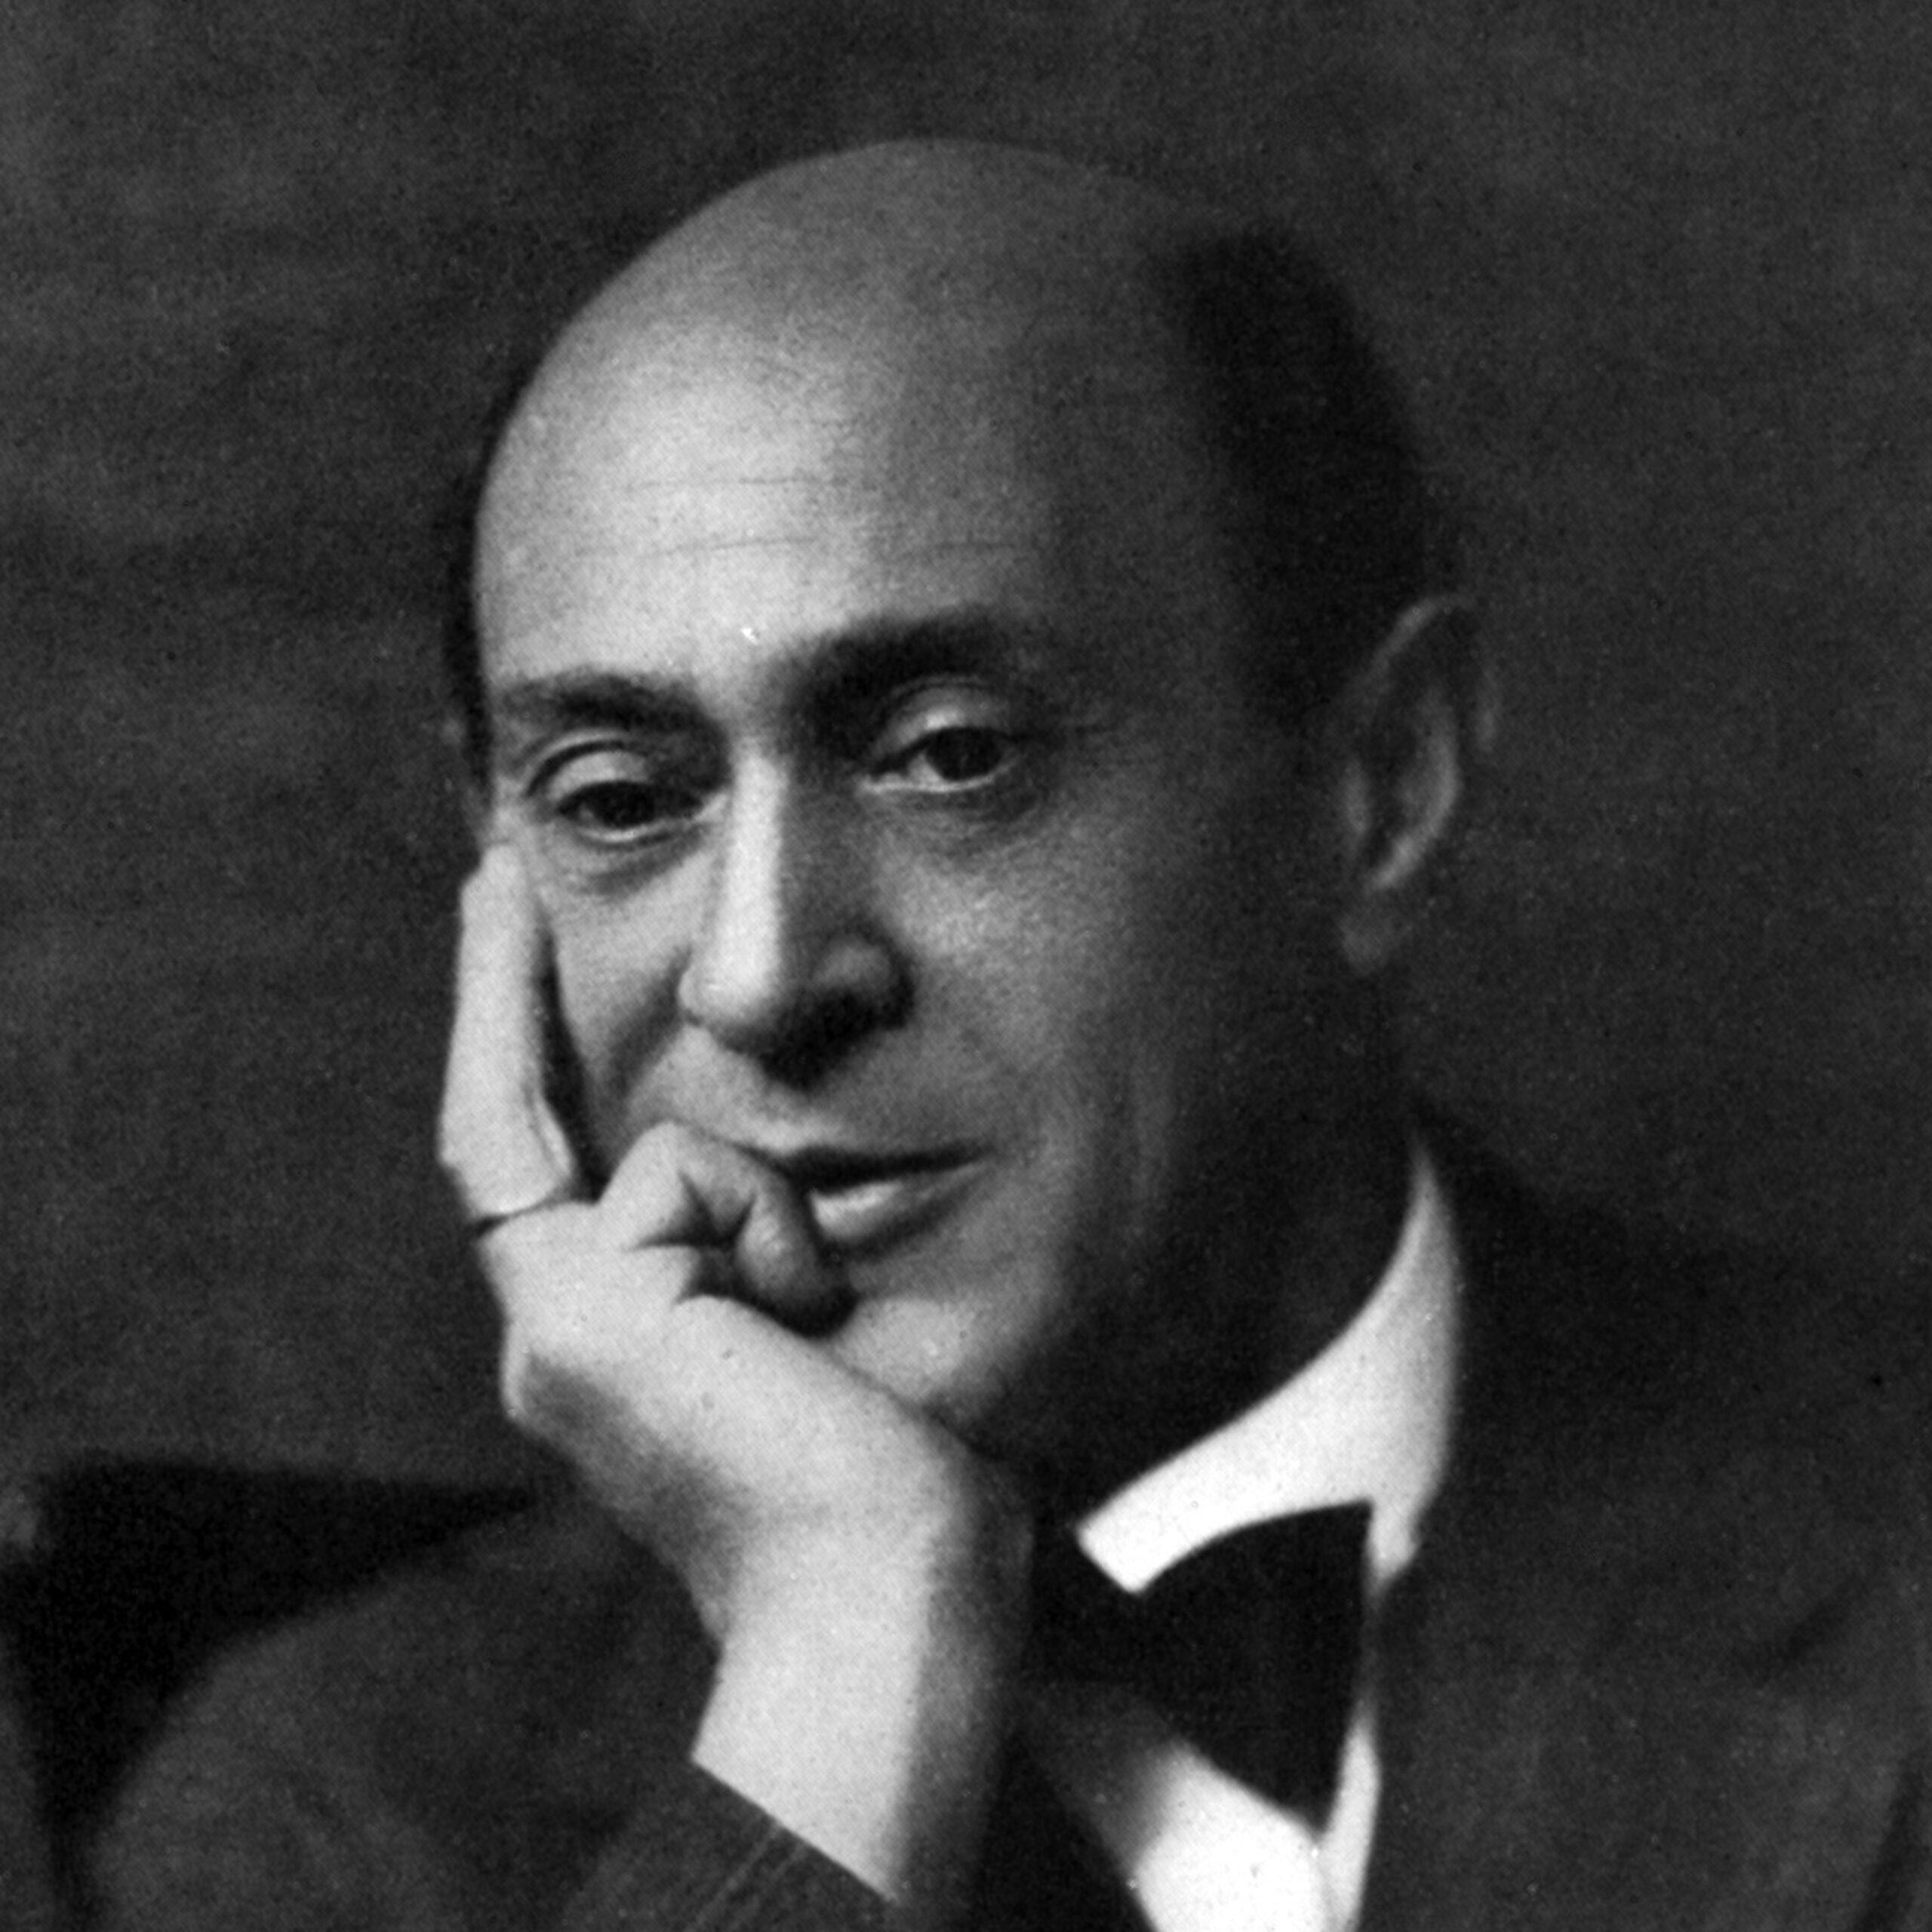 Minoa Chamber Music Festival - Schoenberg - String Quartet 2 in. F sharp minor, op.10 (1907-1908)